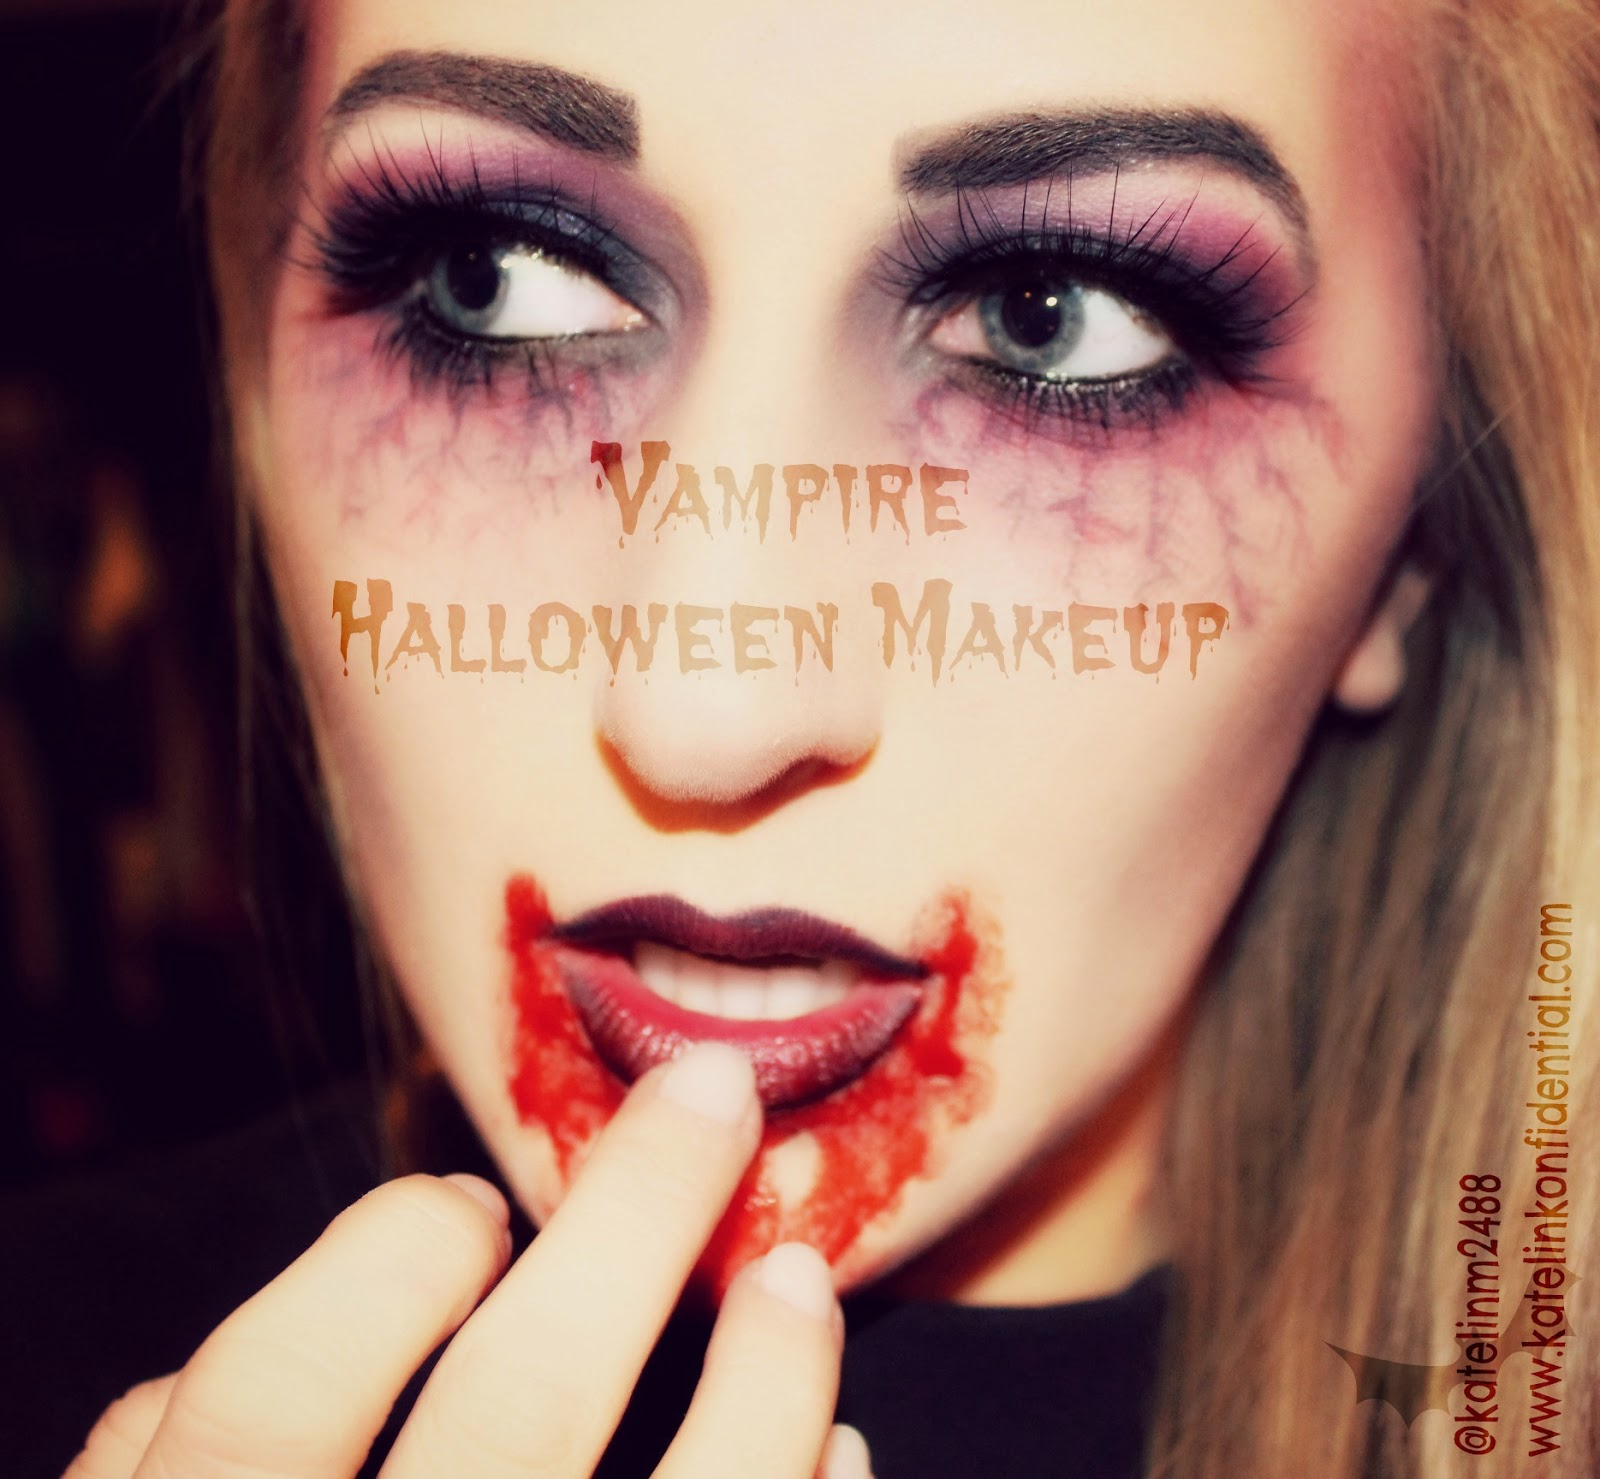 Pretty vampire makeup